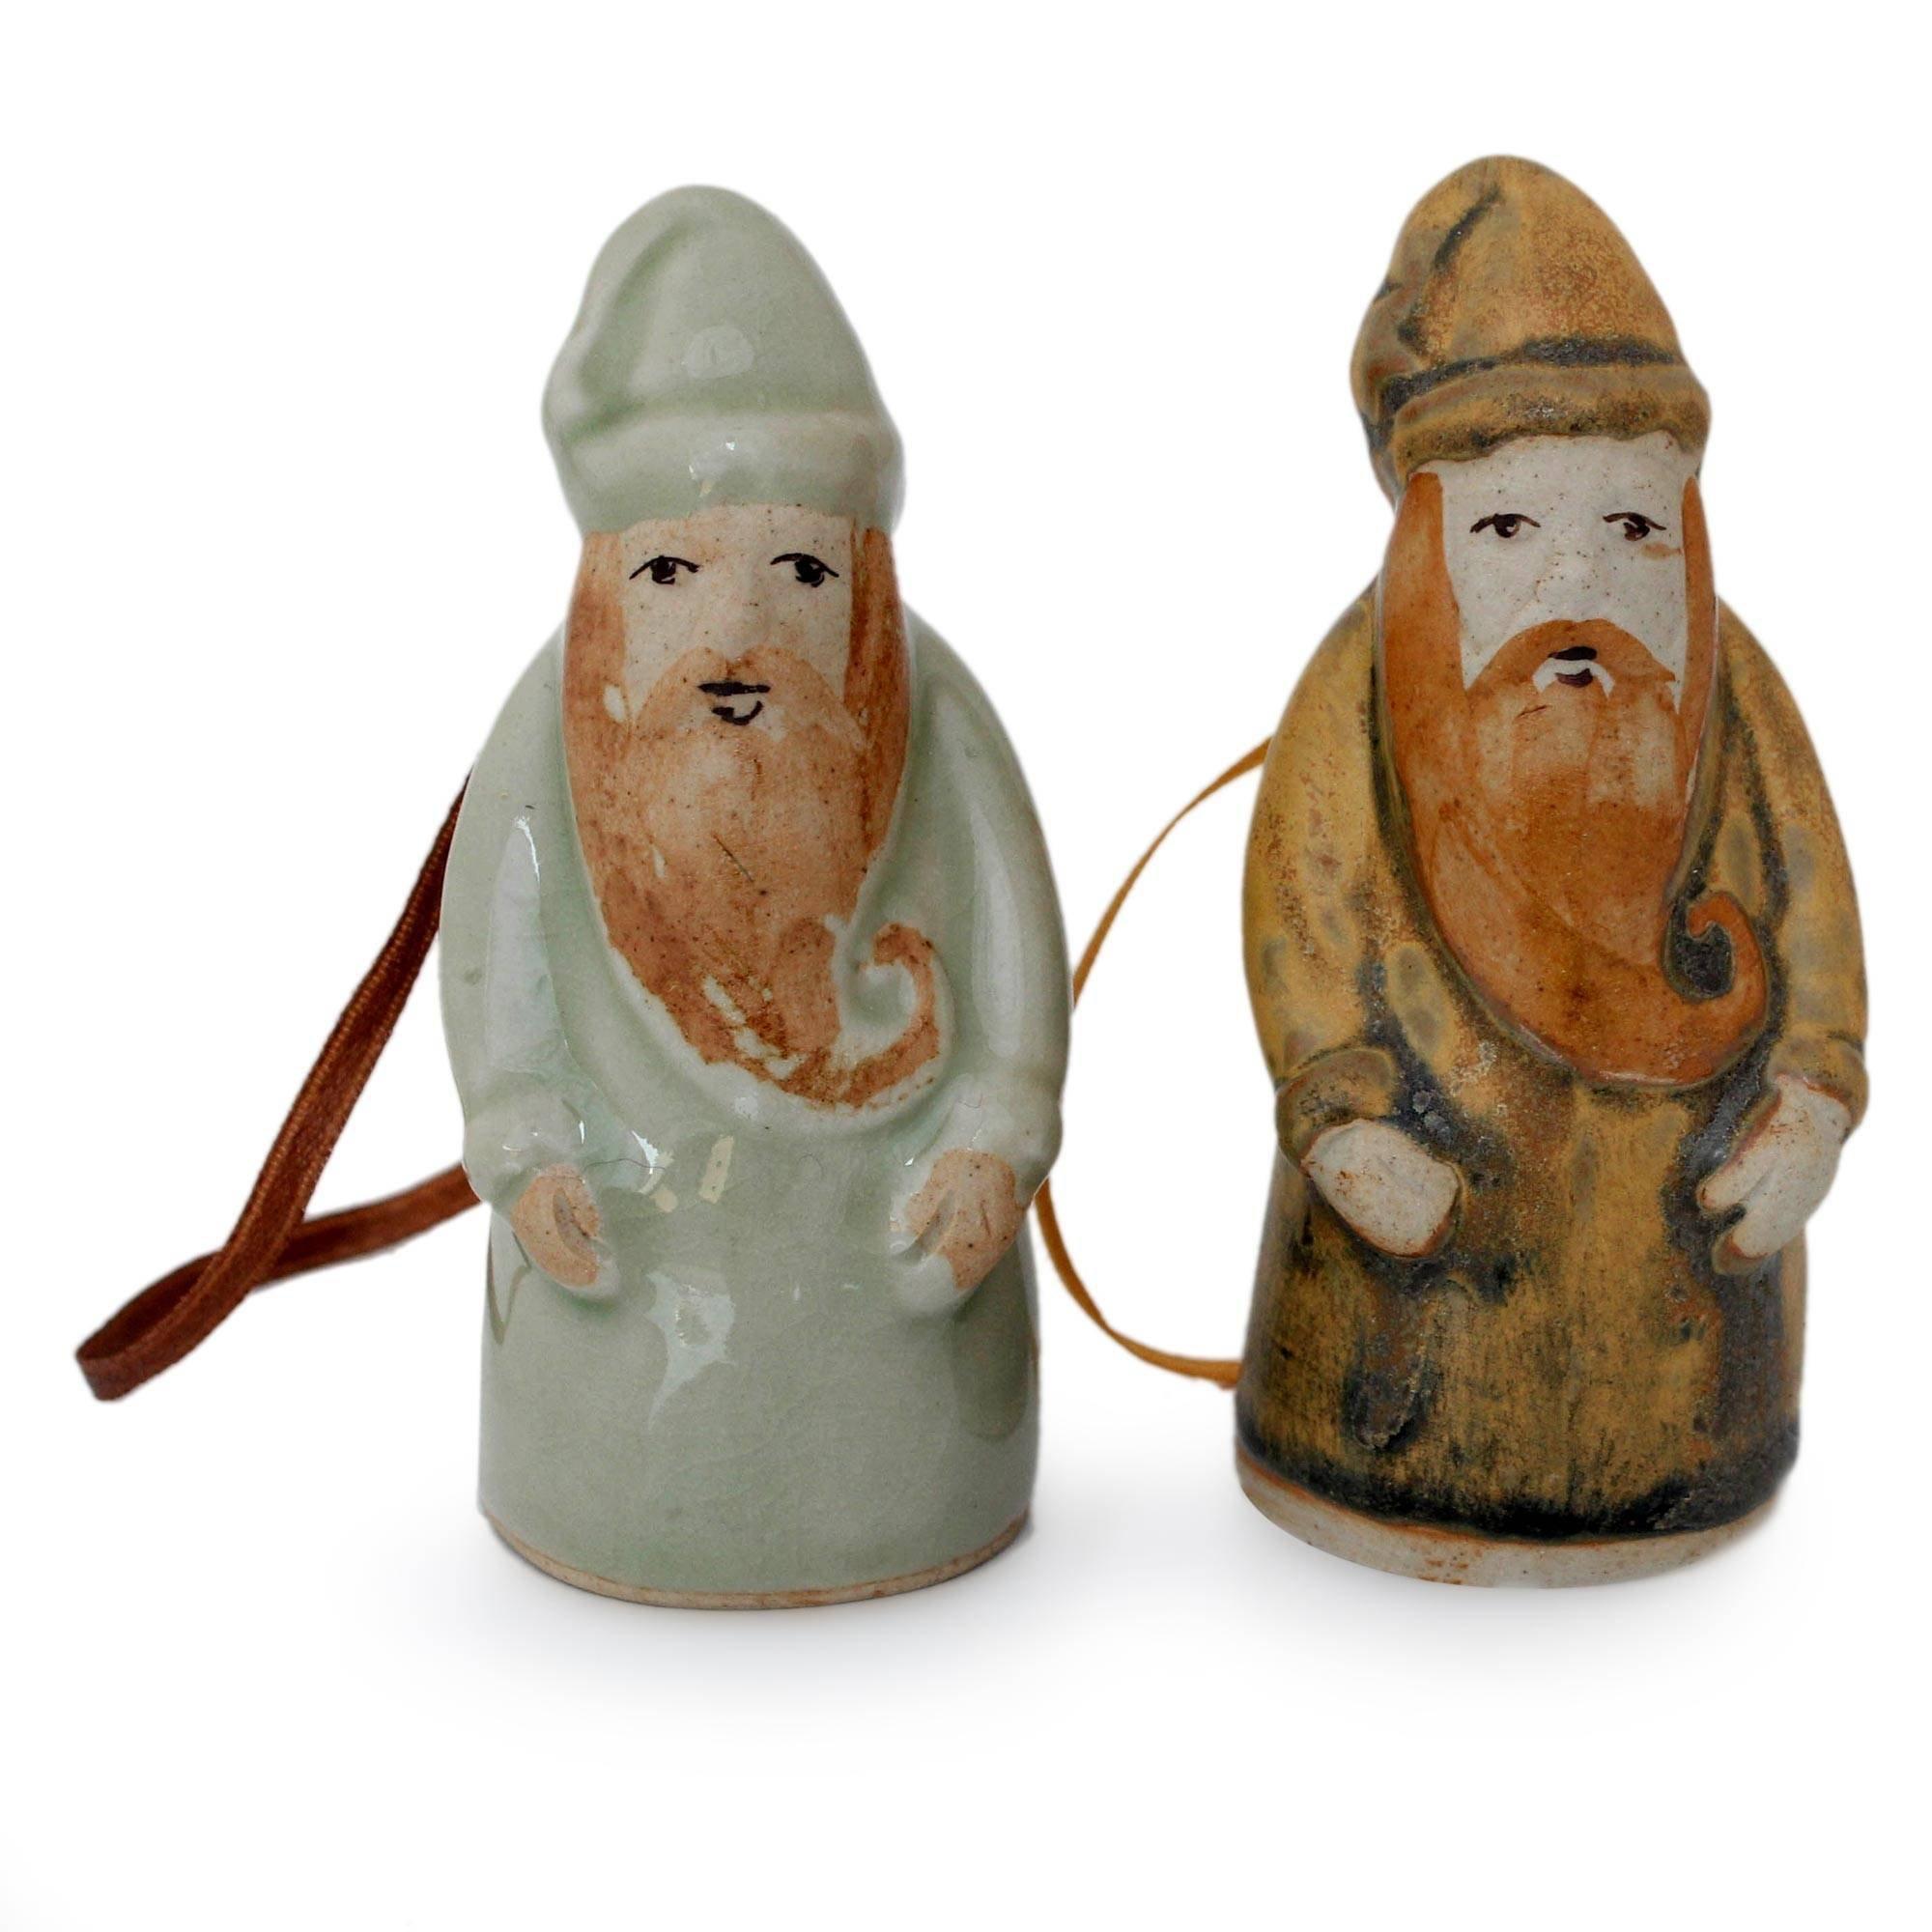 NOVICA Decorative Christmas Ceramic Hanging Holiday Ornament, Assorted, 'Thai Santa Claus' (Pair) by NOVICA